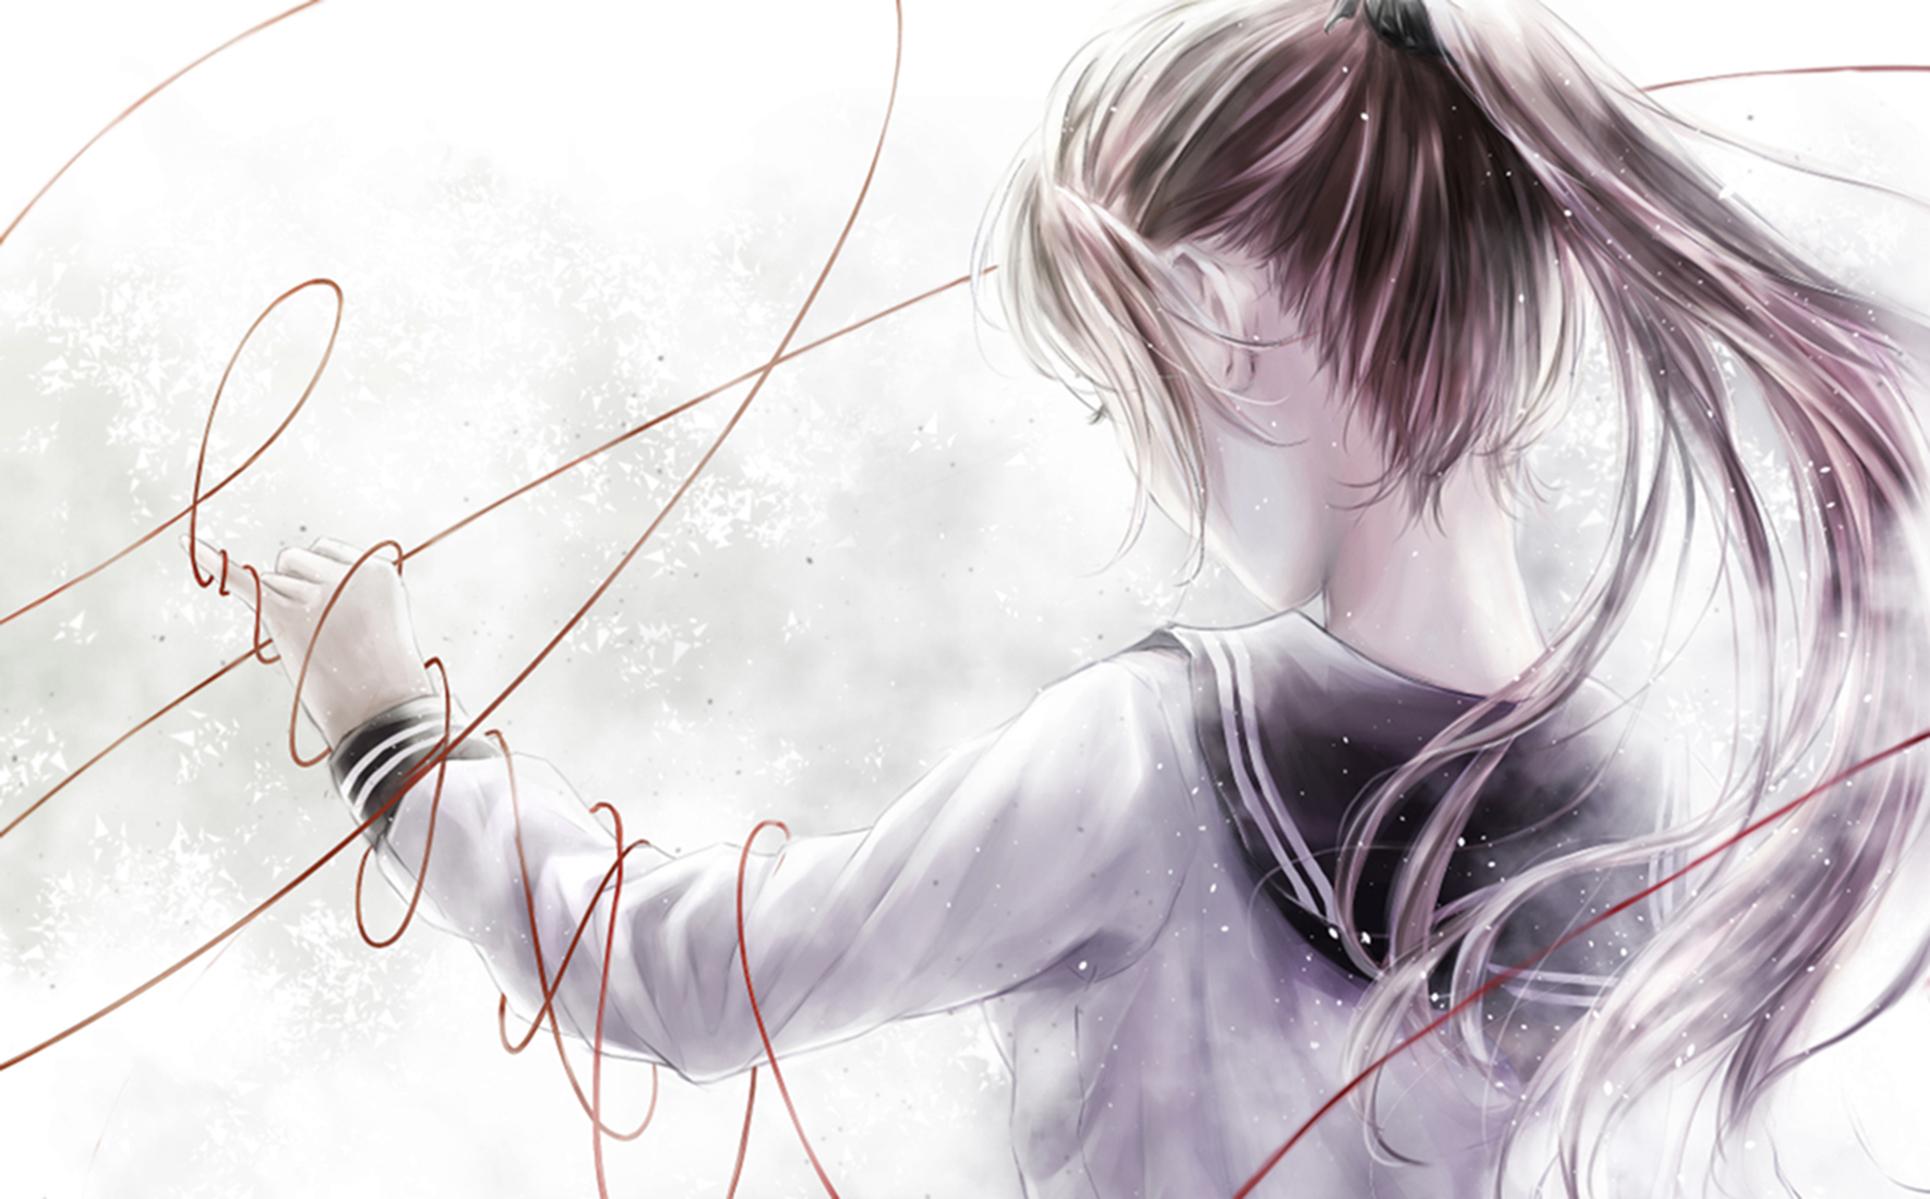 Anime Girl Full HD Wallpaper And Background